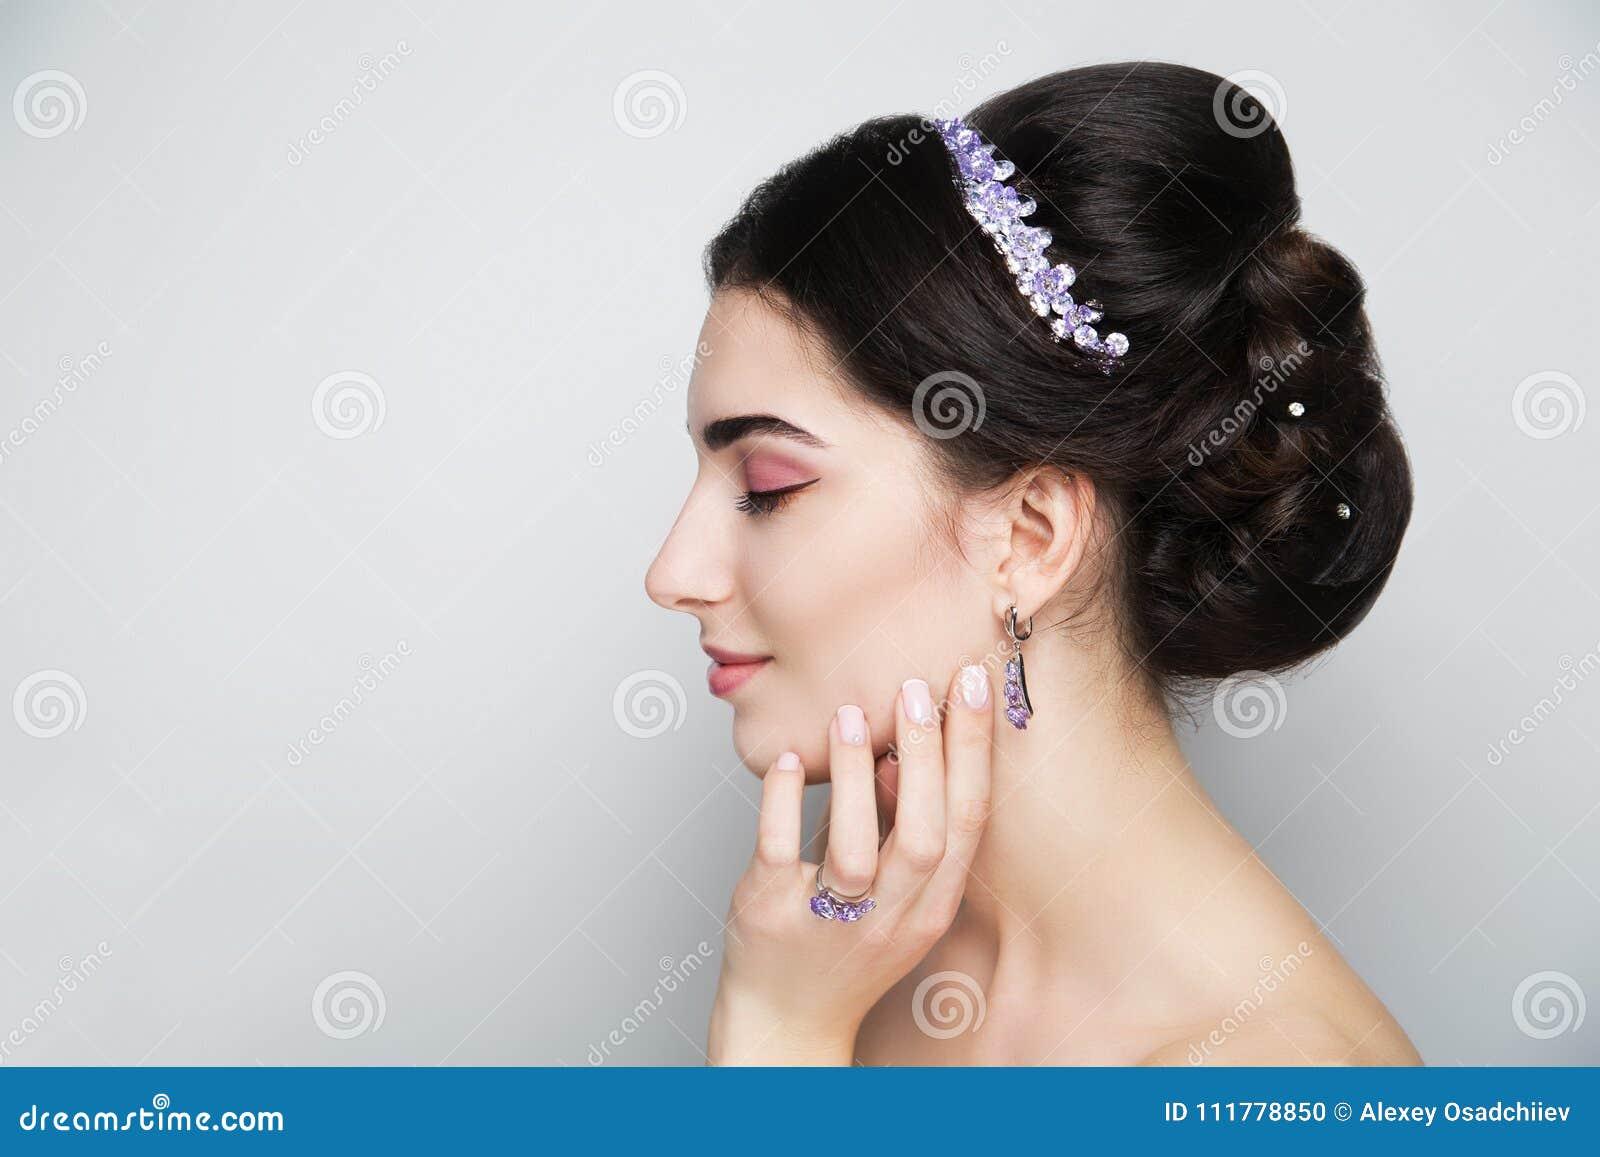 Woman brunette hair styling